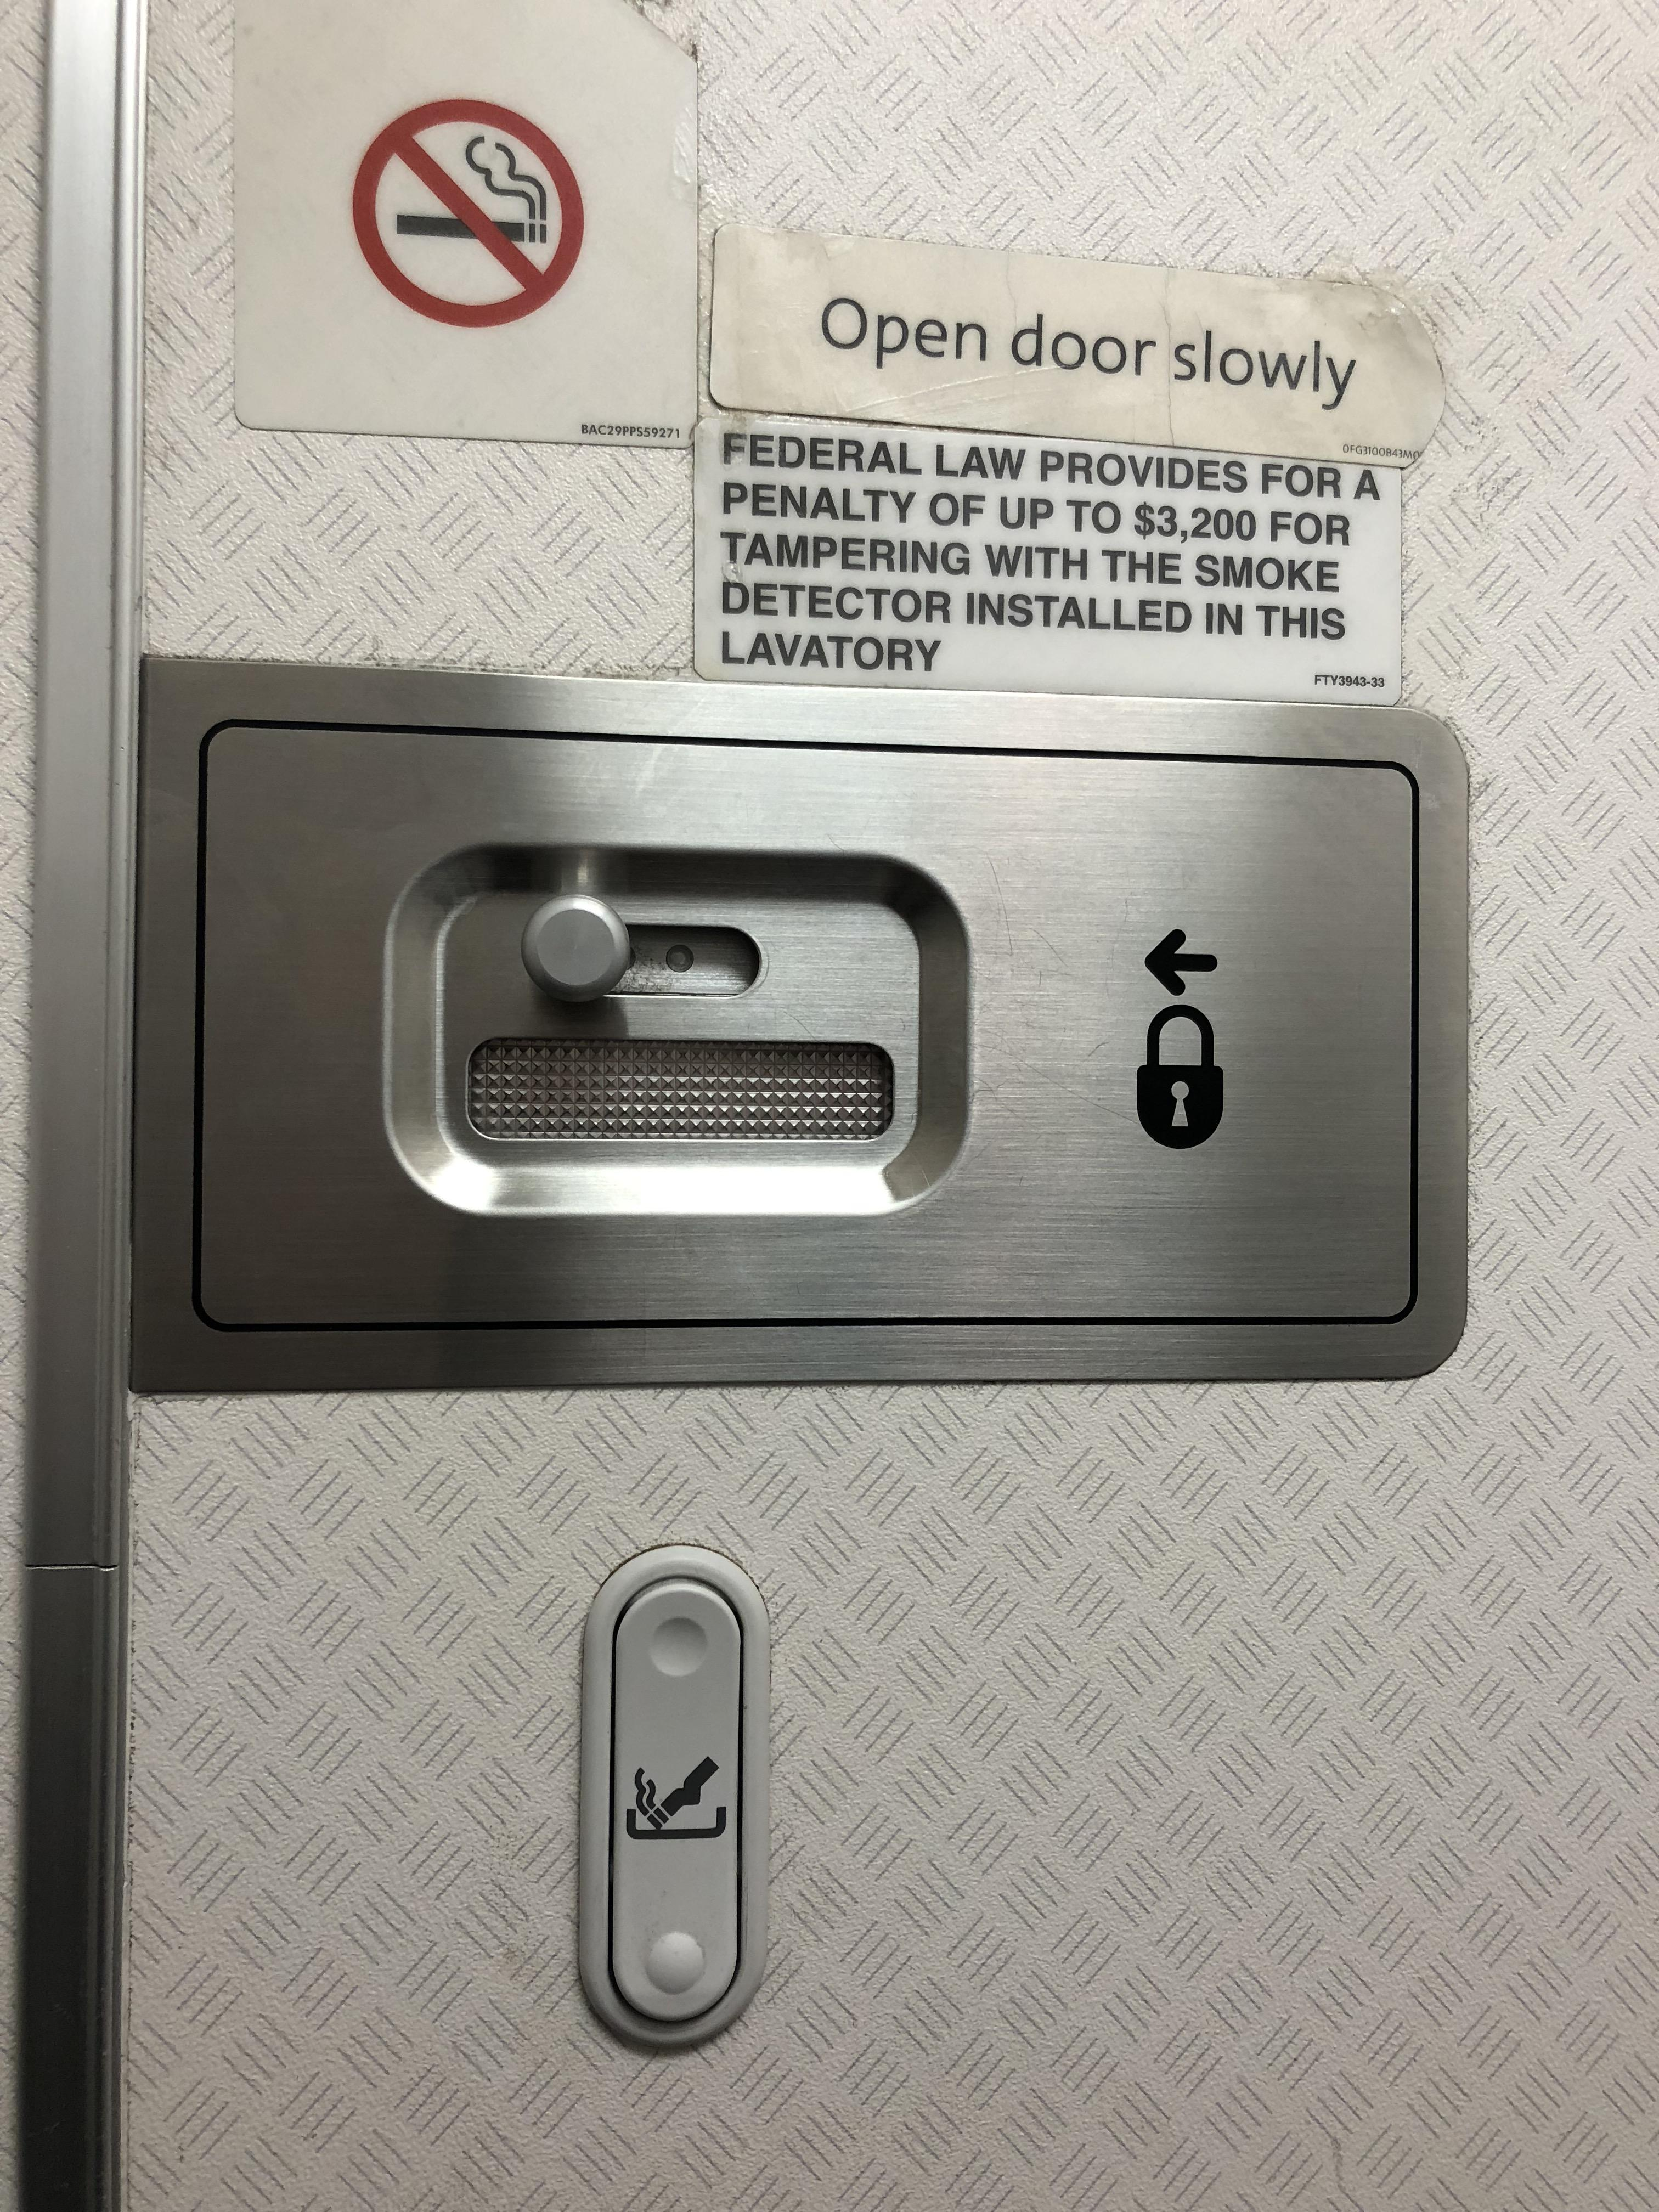 My airplane bathroom has an ashtray in it  mildlyinteresting